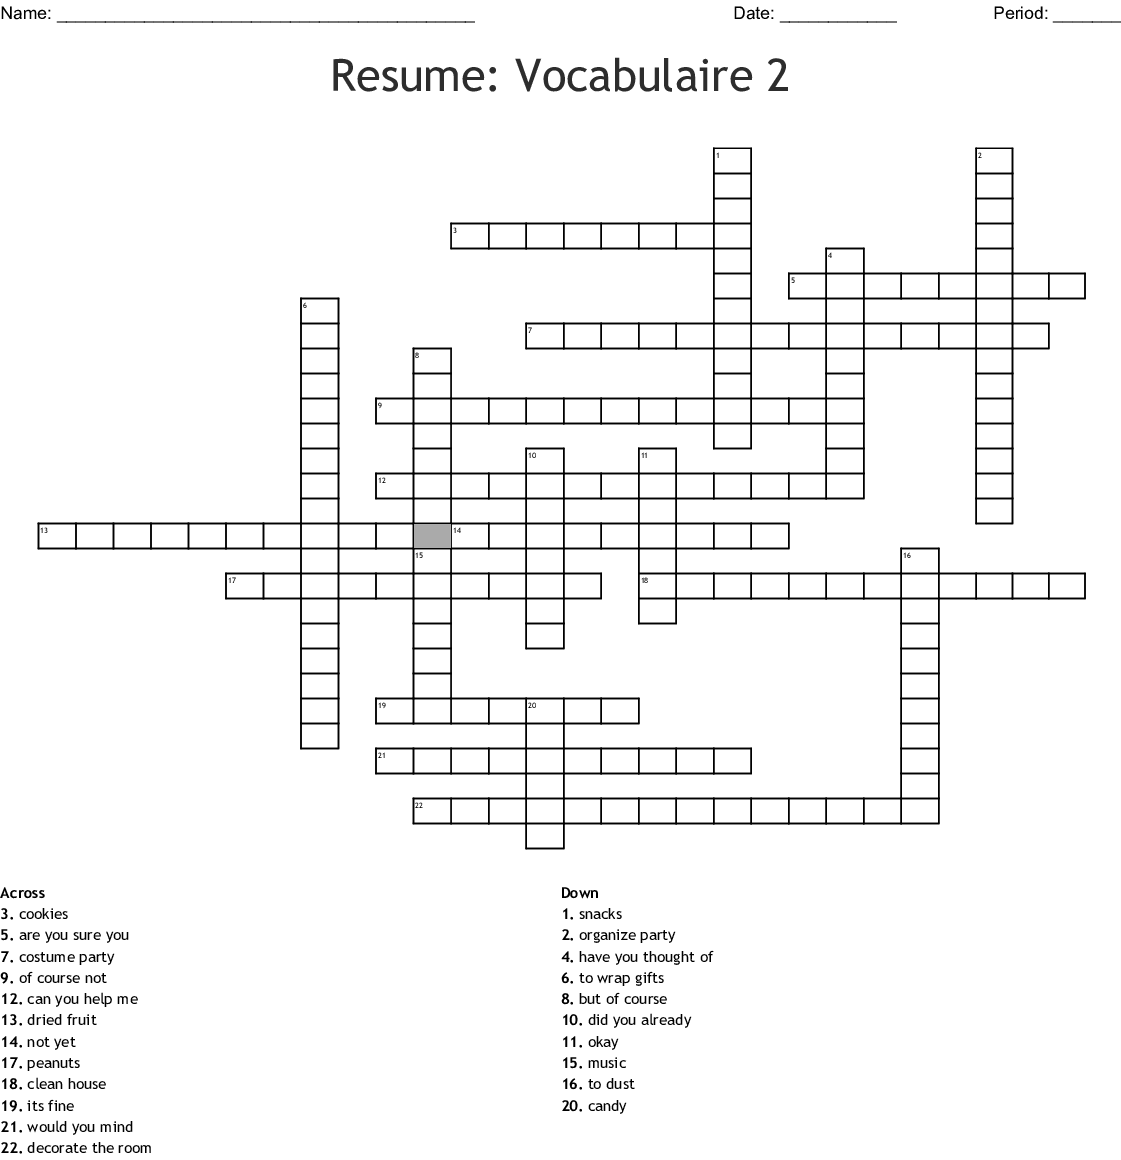 Resume Vocabulaire 2 Crossword